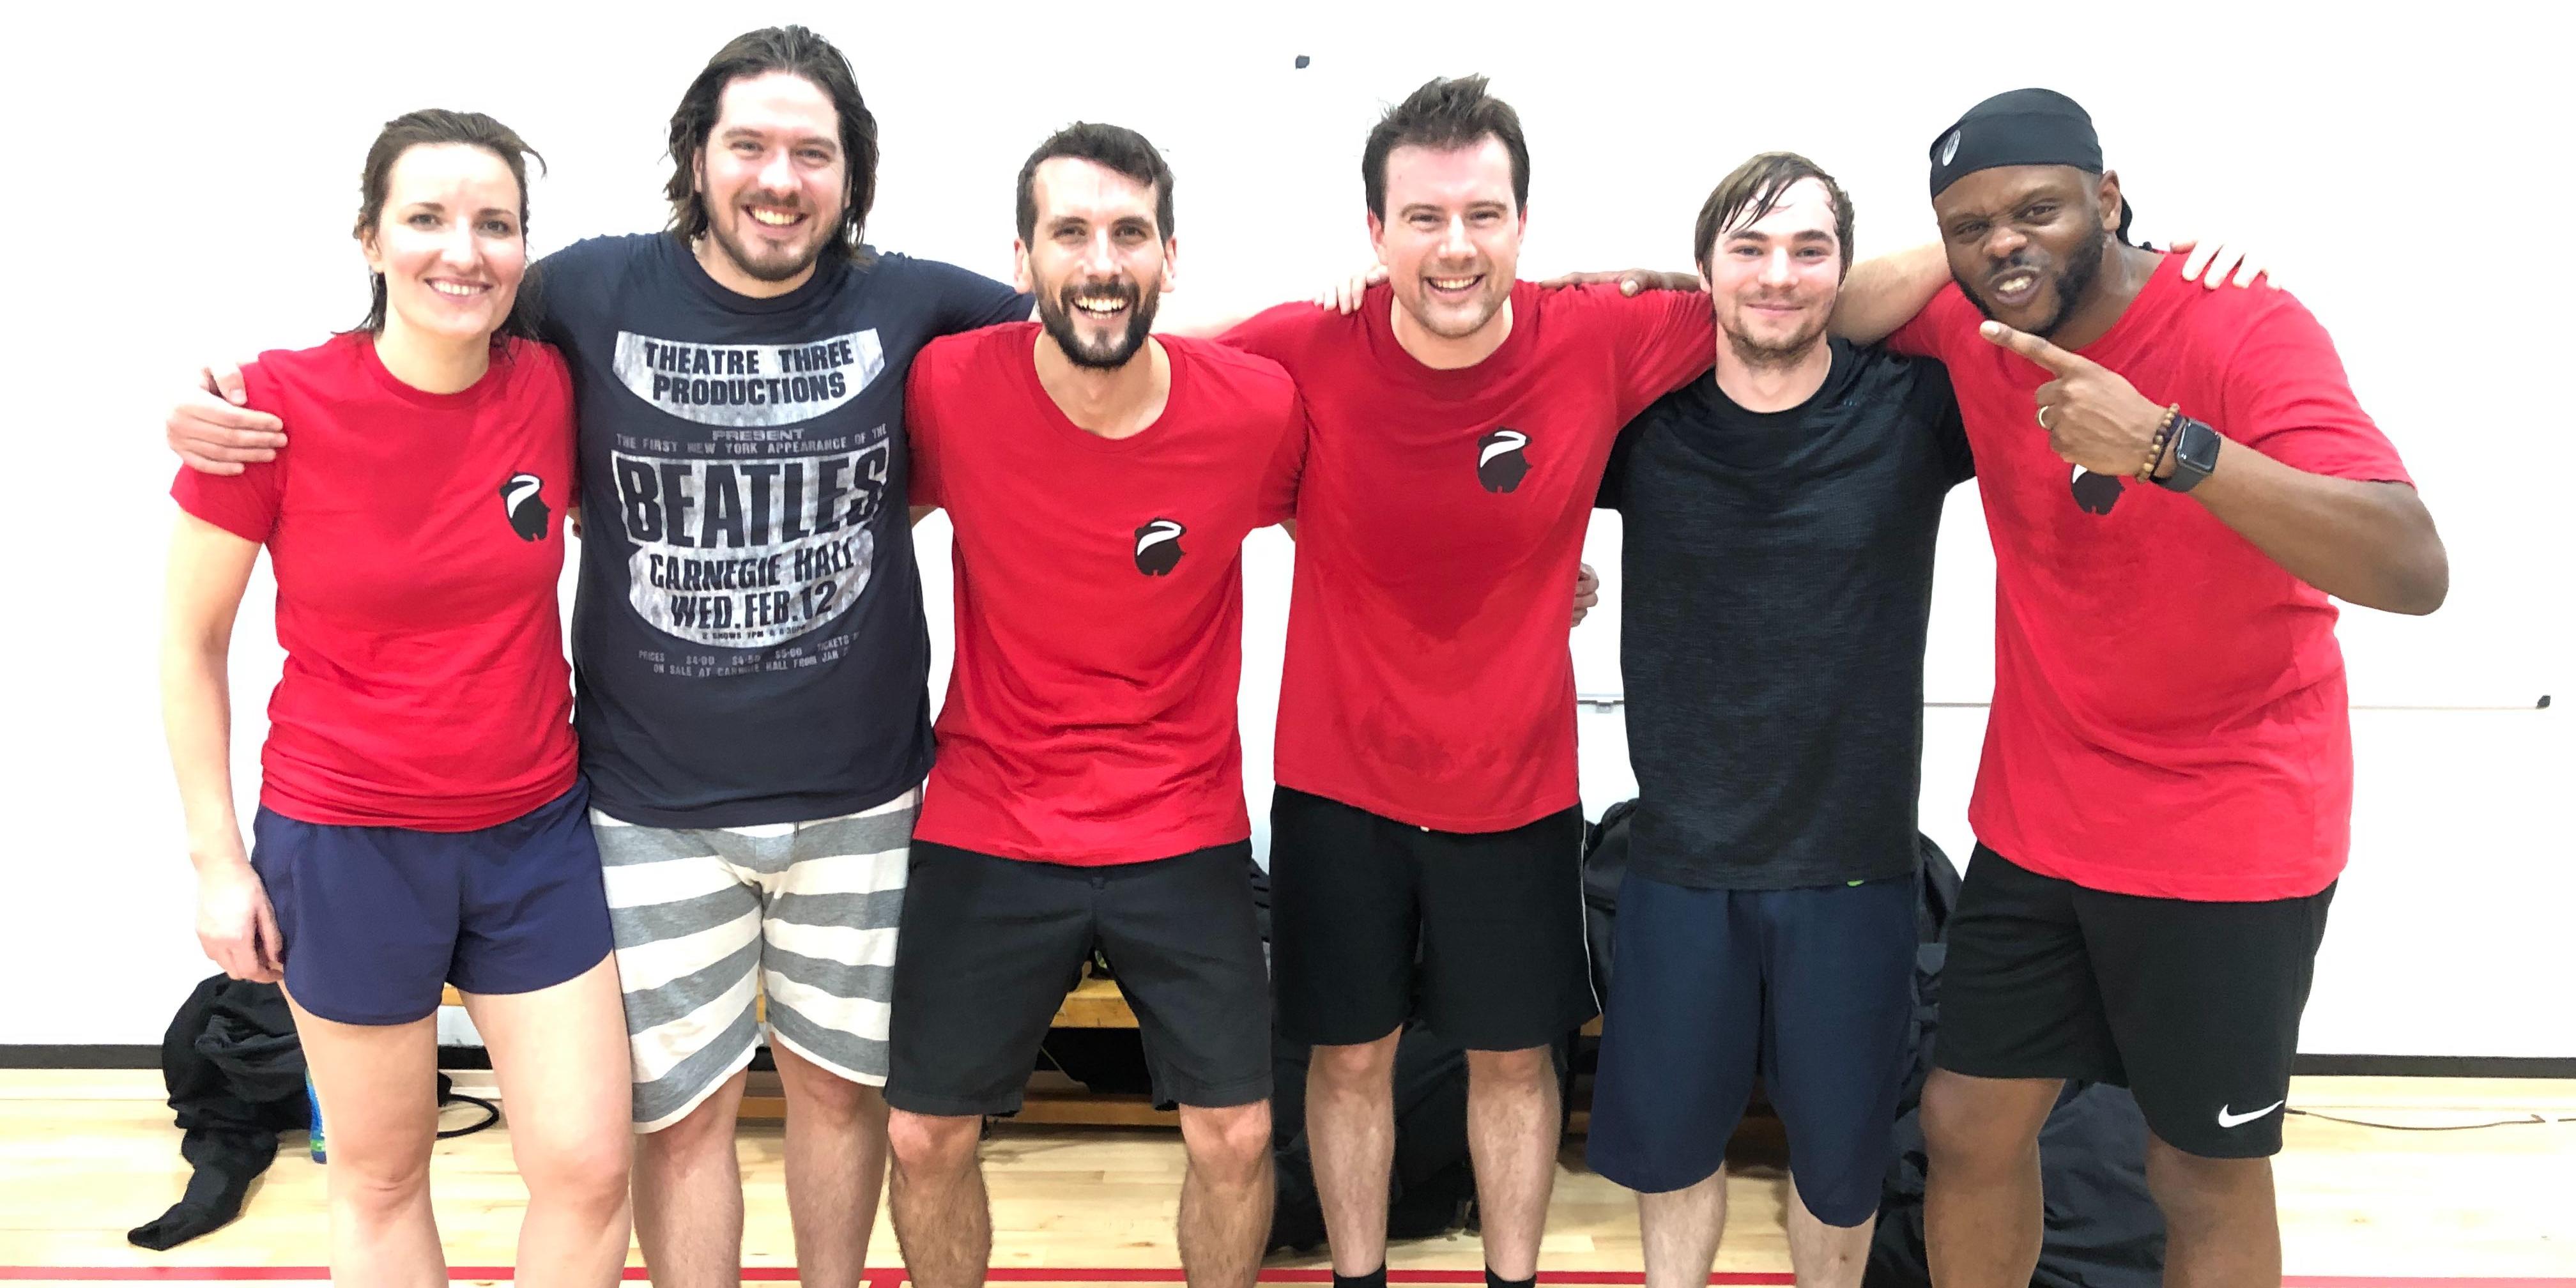 Our dodgeball team